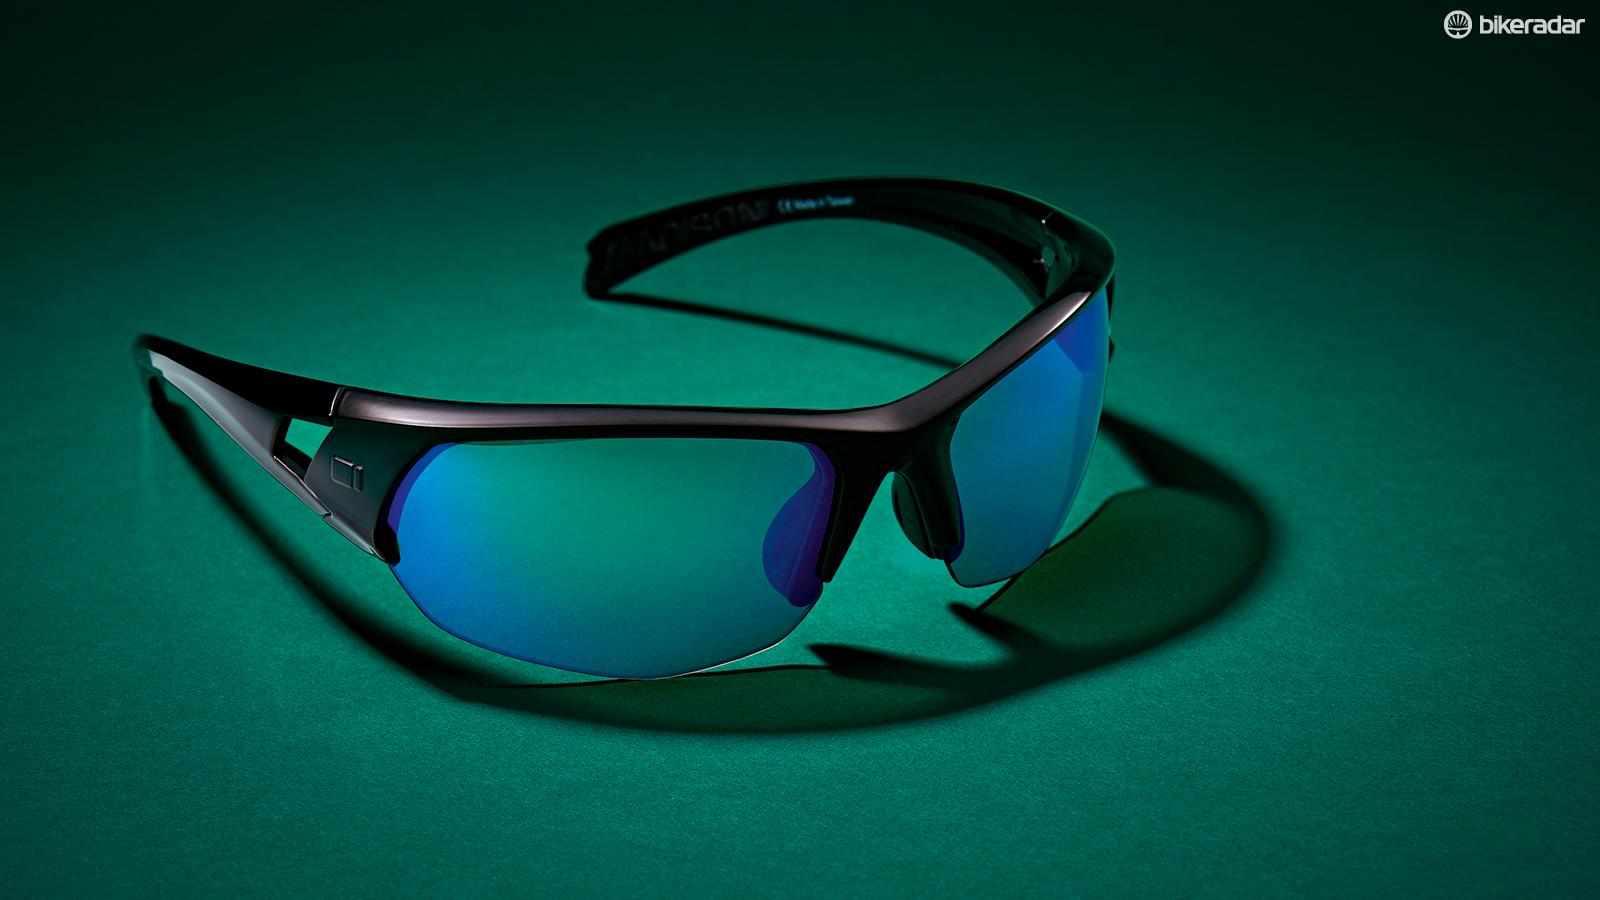 Madison's Mission sunglasses are a solid no-nonsense option